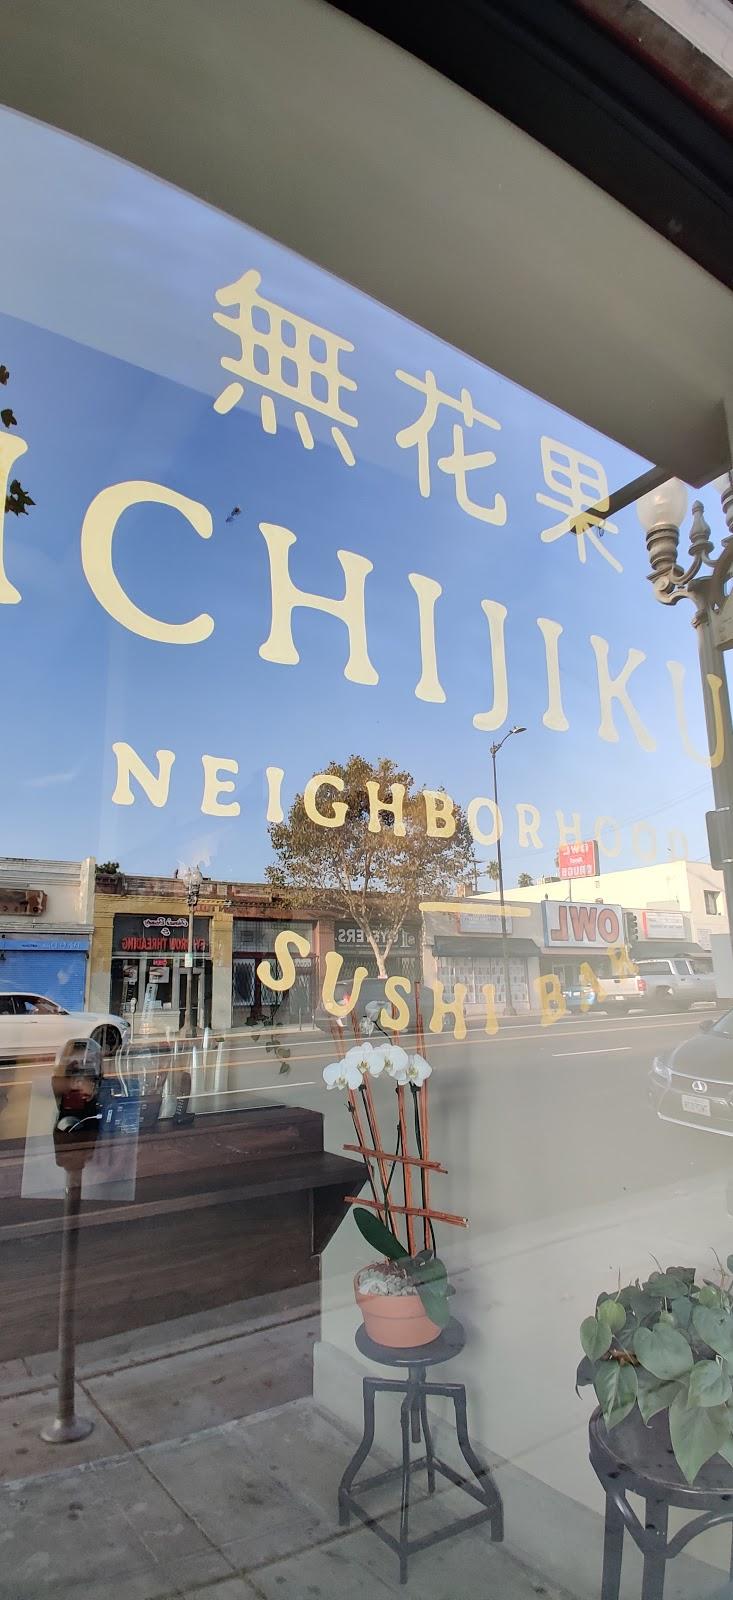 Ichijiku Sushi - restaurant    Photo 10 of 10   Address: 5629, 1/2 N Figueroa St, Los Angeles, CA 90042, USA   Phone: (323) 739-6232